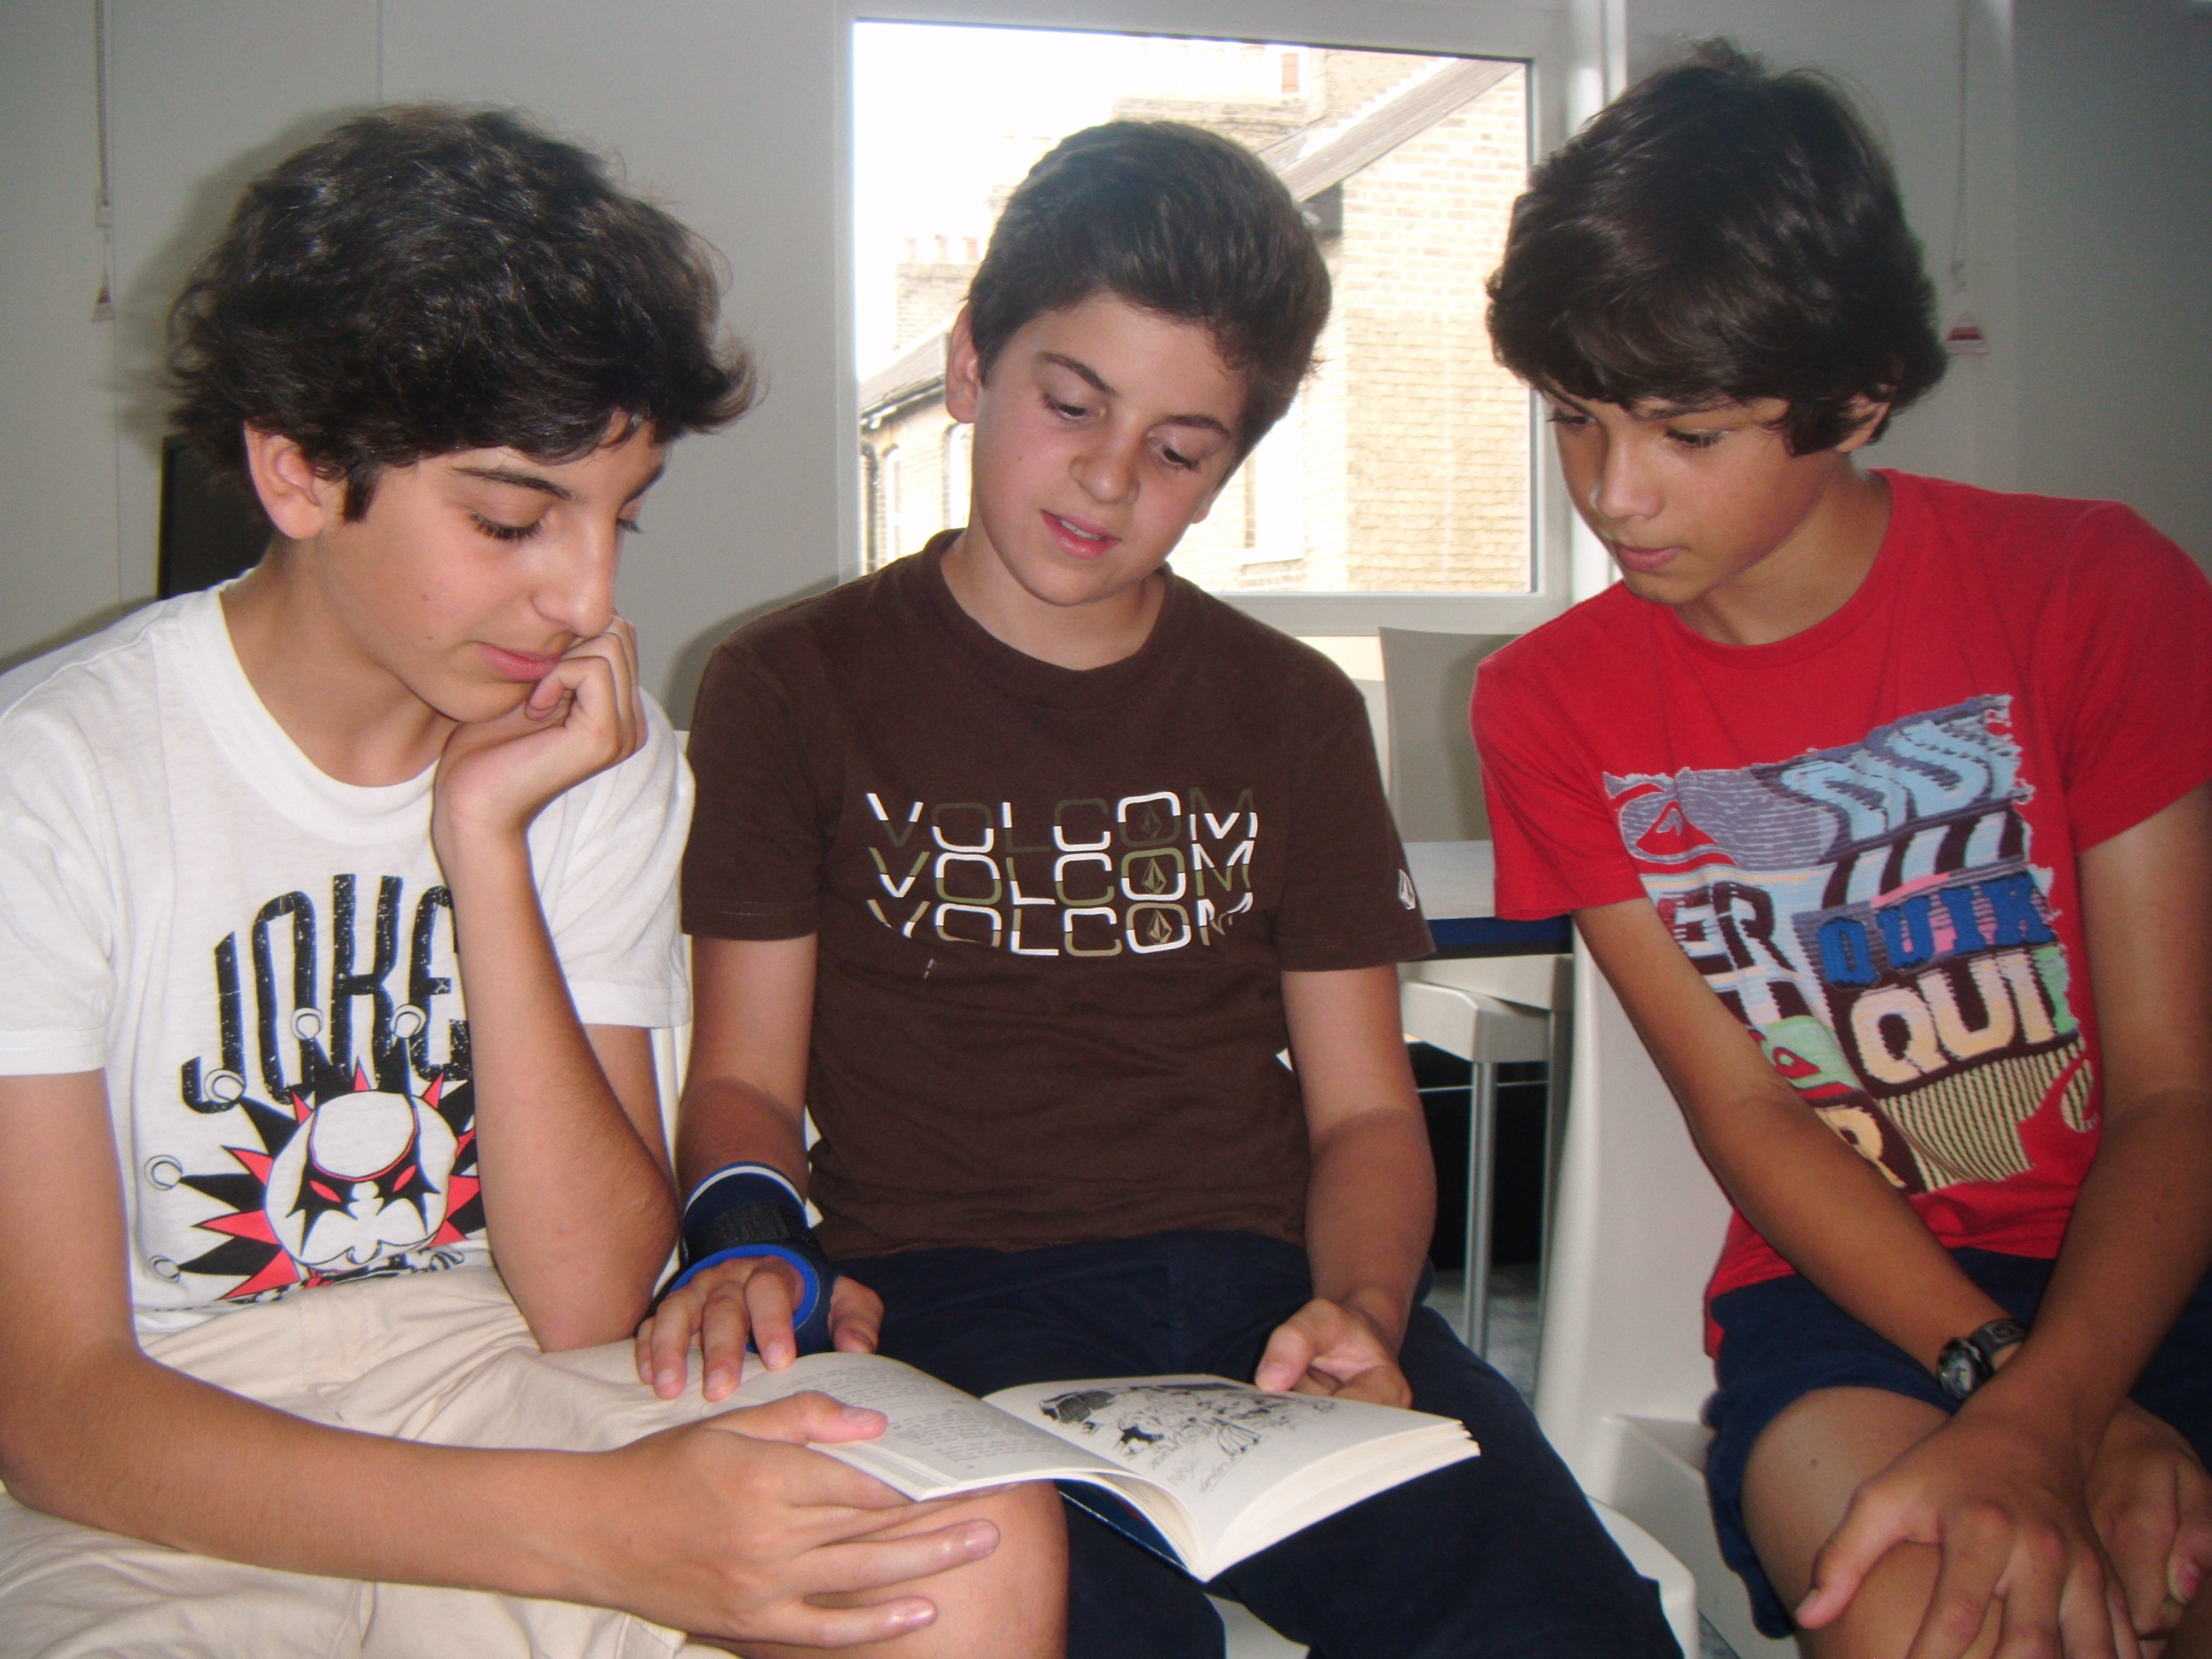 3 boys in classroom